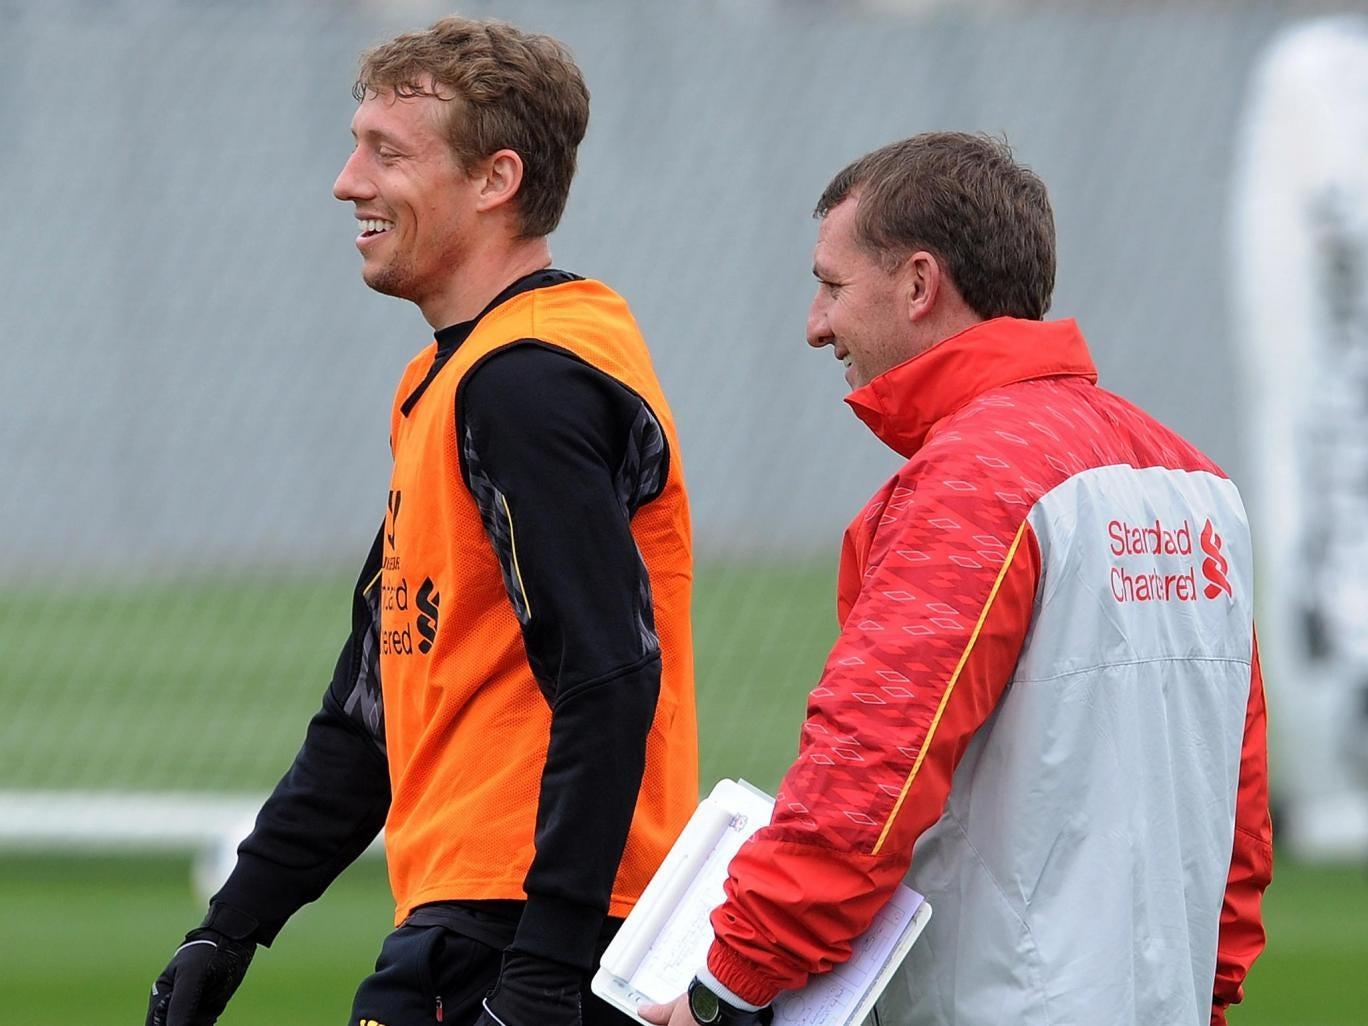 Brendan Rodgers has praised midfielder Lucas Leiva ahead of his return to fitness